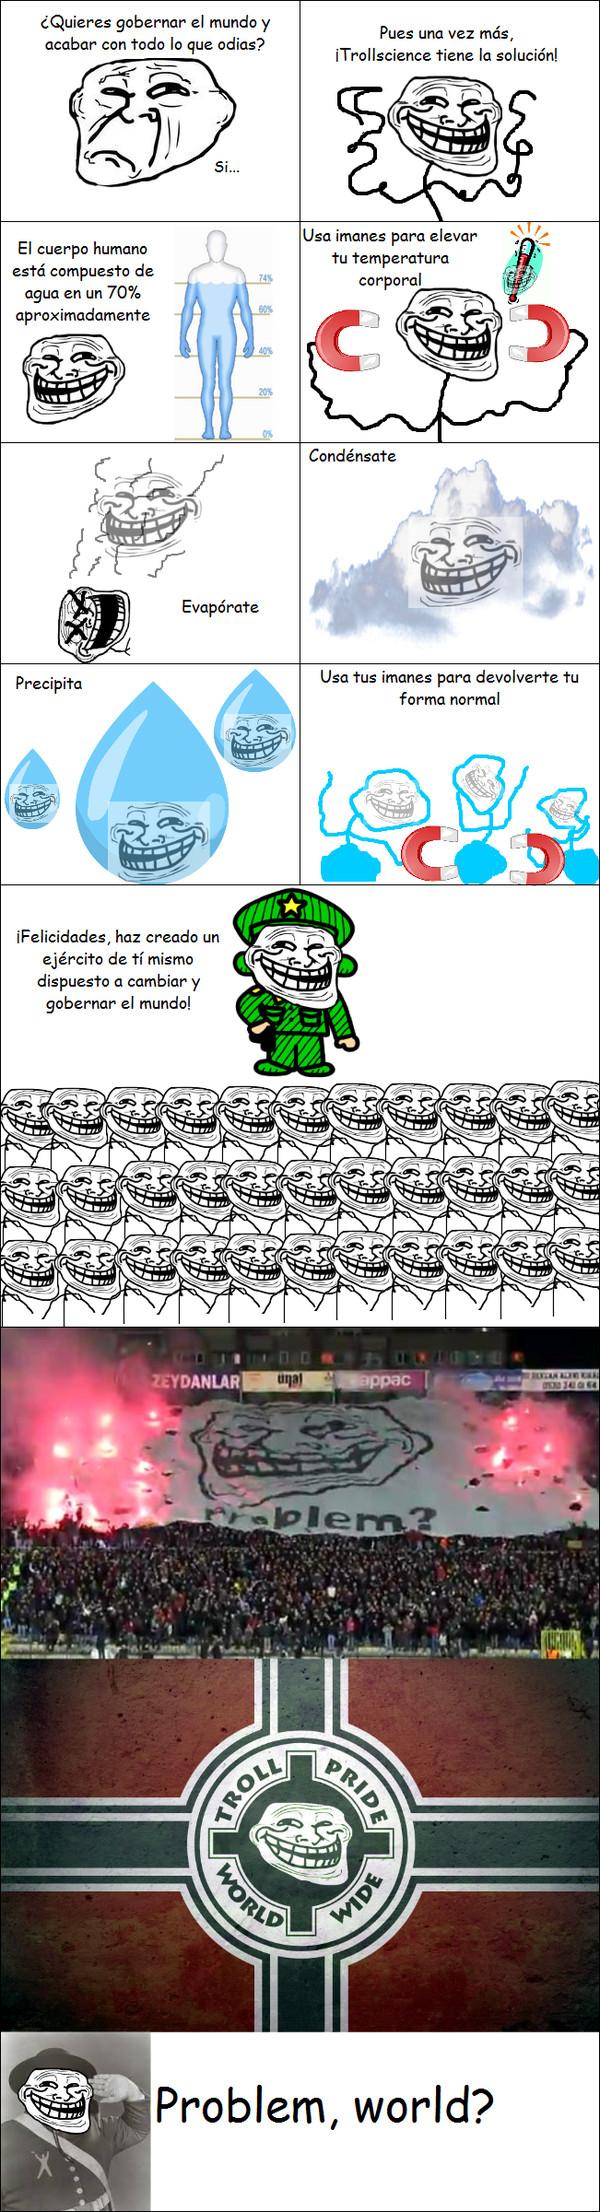 Trollface - Ciclo del agua Troll